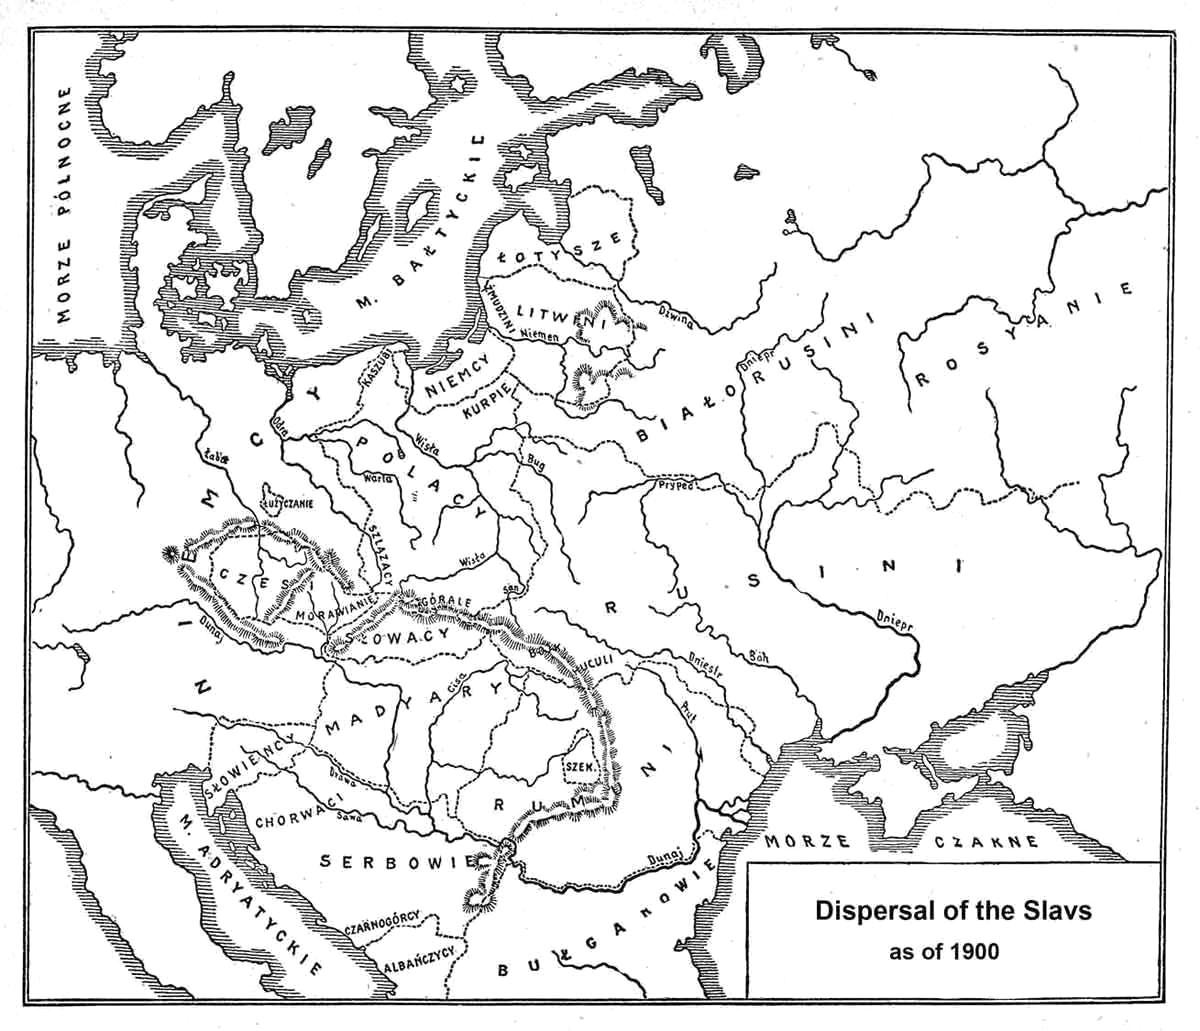 European Map 1910 as of 1900 1910 Map).jpg